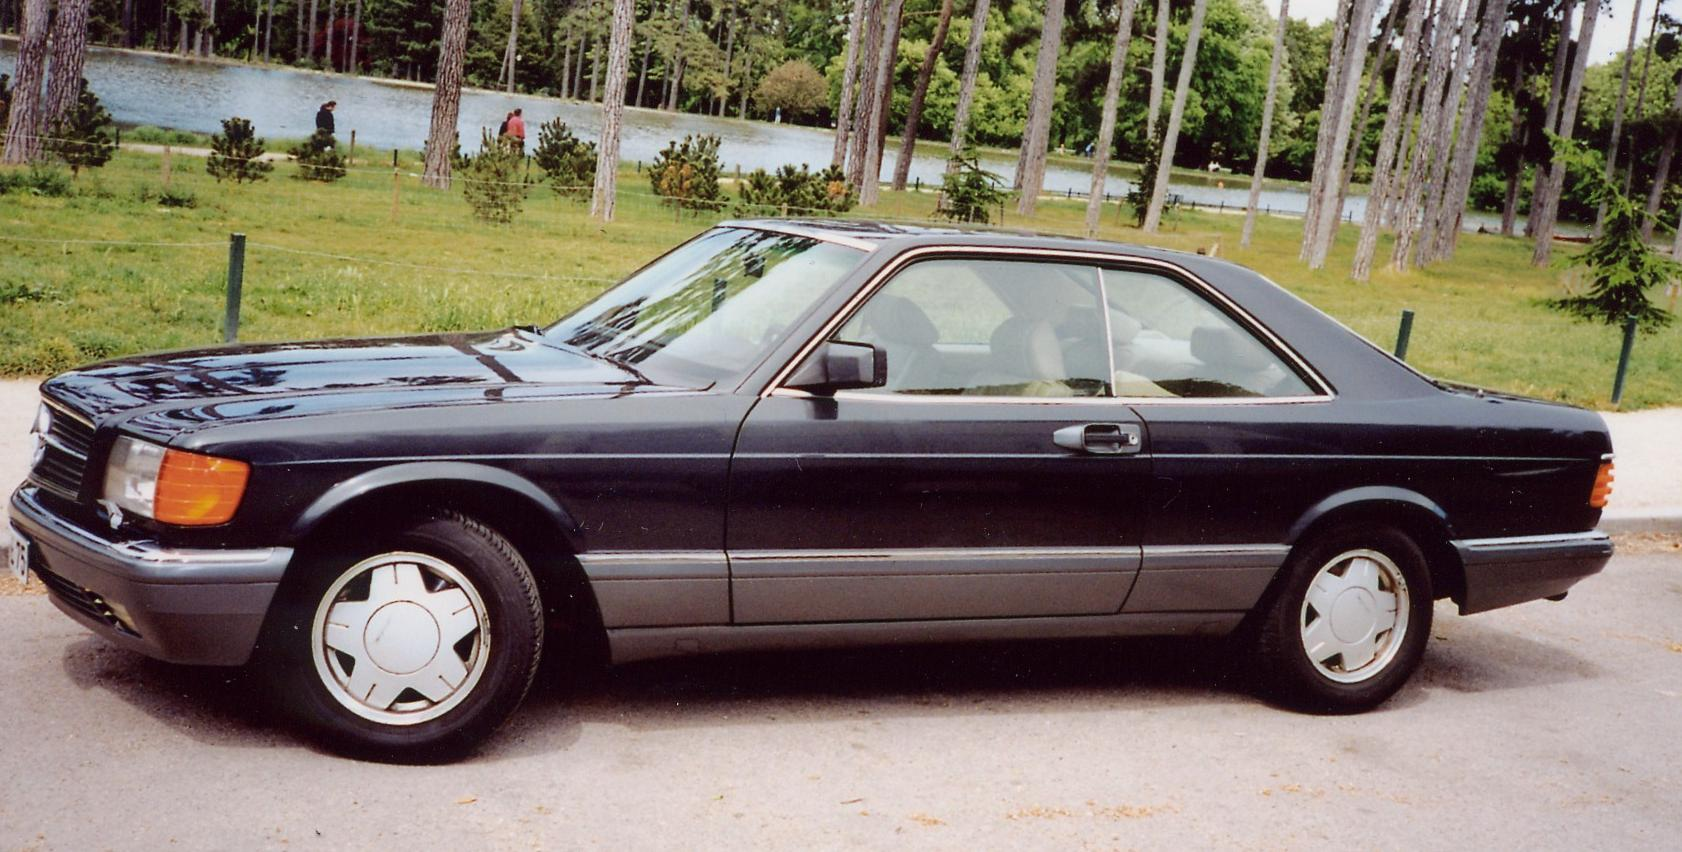 file 1986 1991 mercedes benz 560 sec c126 coupe wikimedia commons. Black Bedroom Furniture Sets. Home Design Ideas